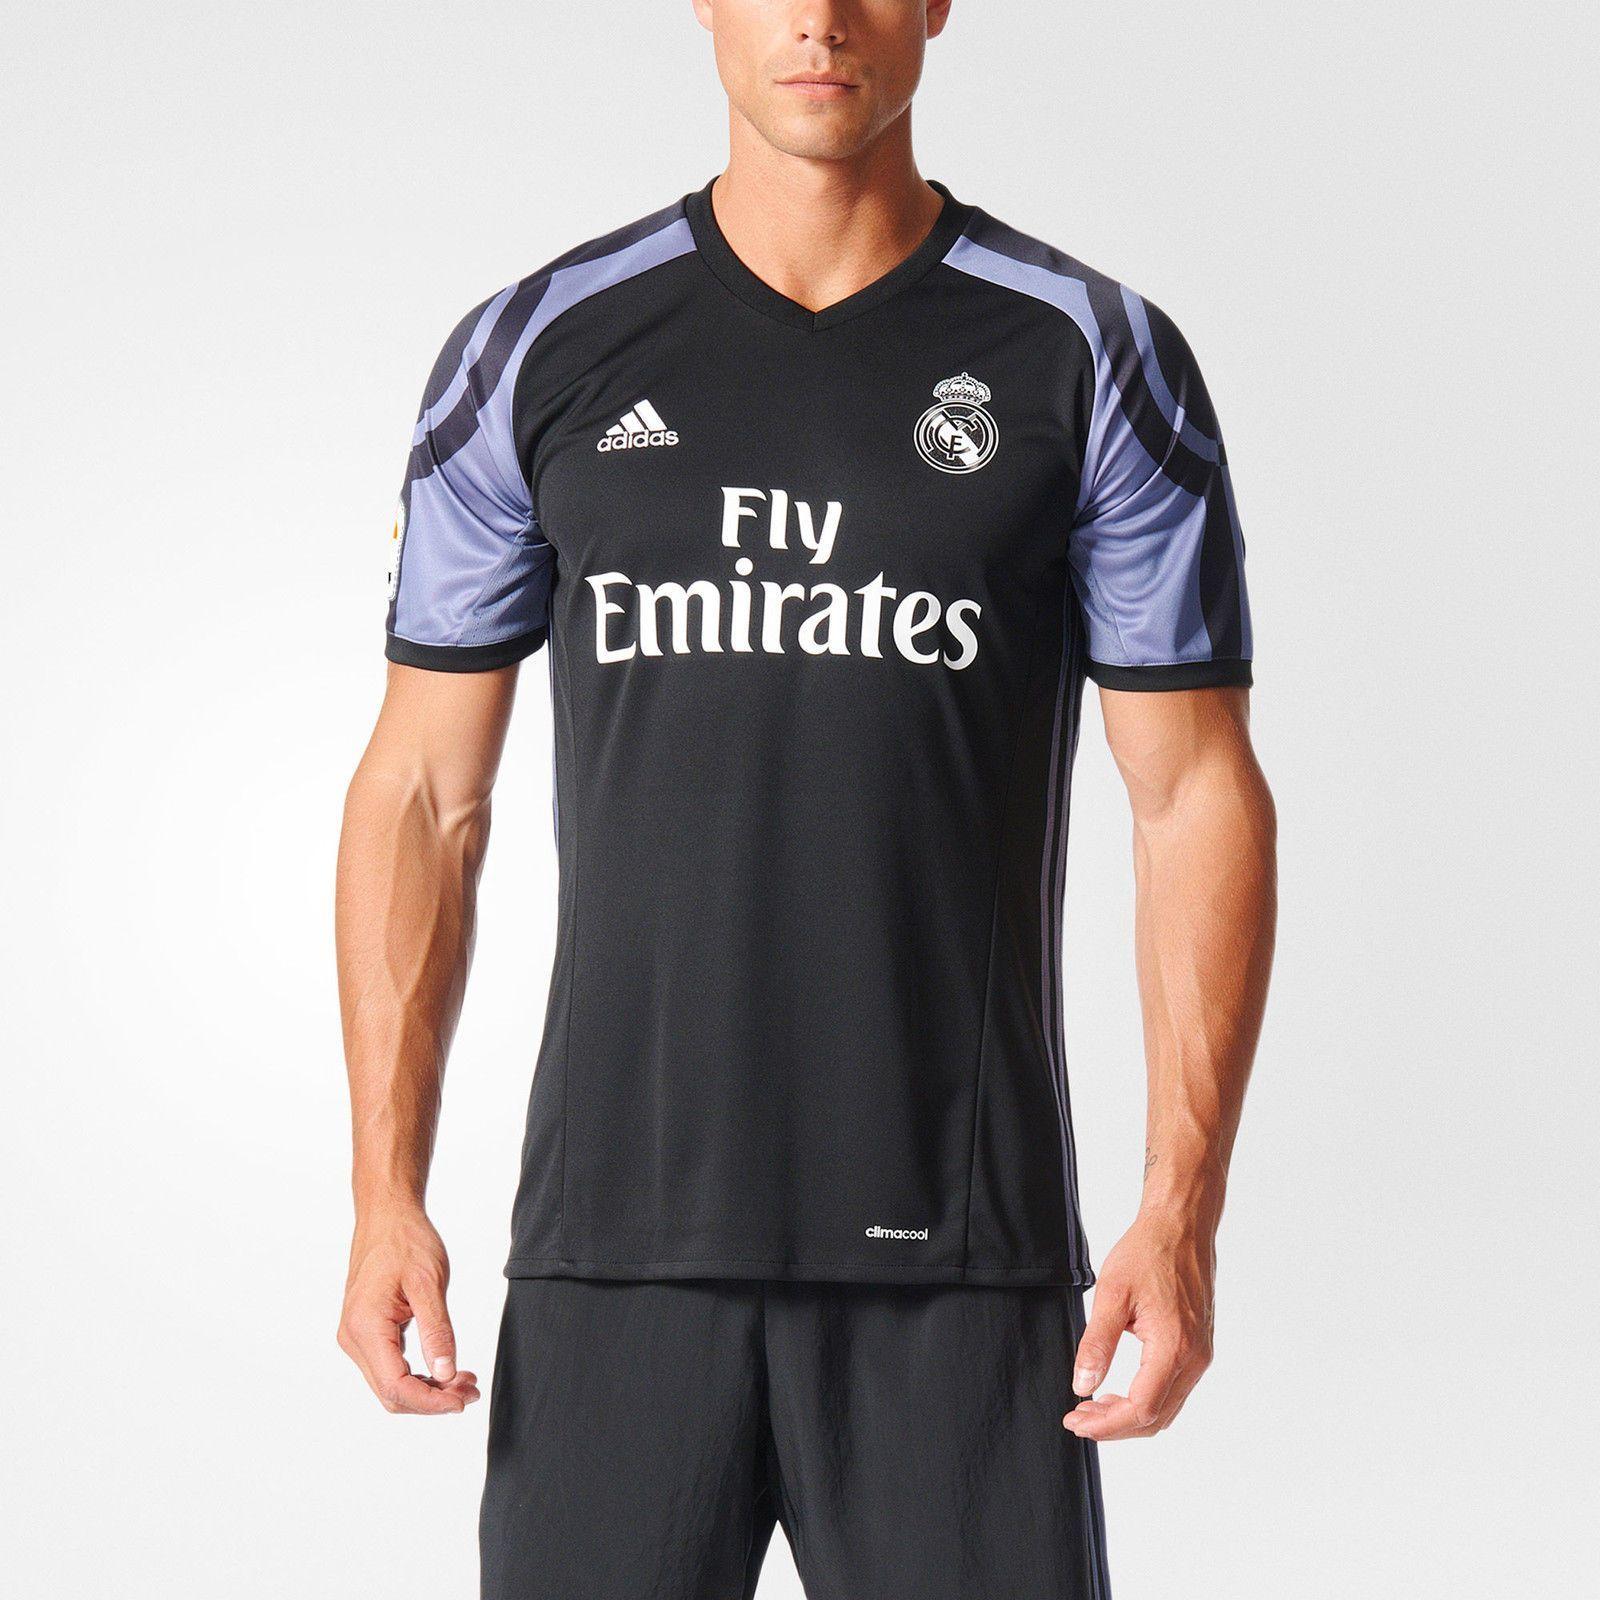 lowest price d90e4 079de Details about adidas Manchester United Home Jersey Men's ...